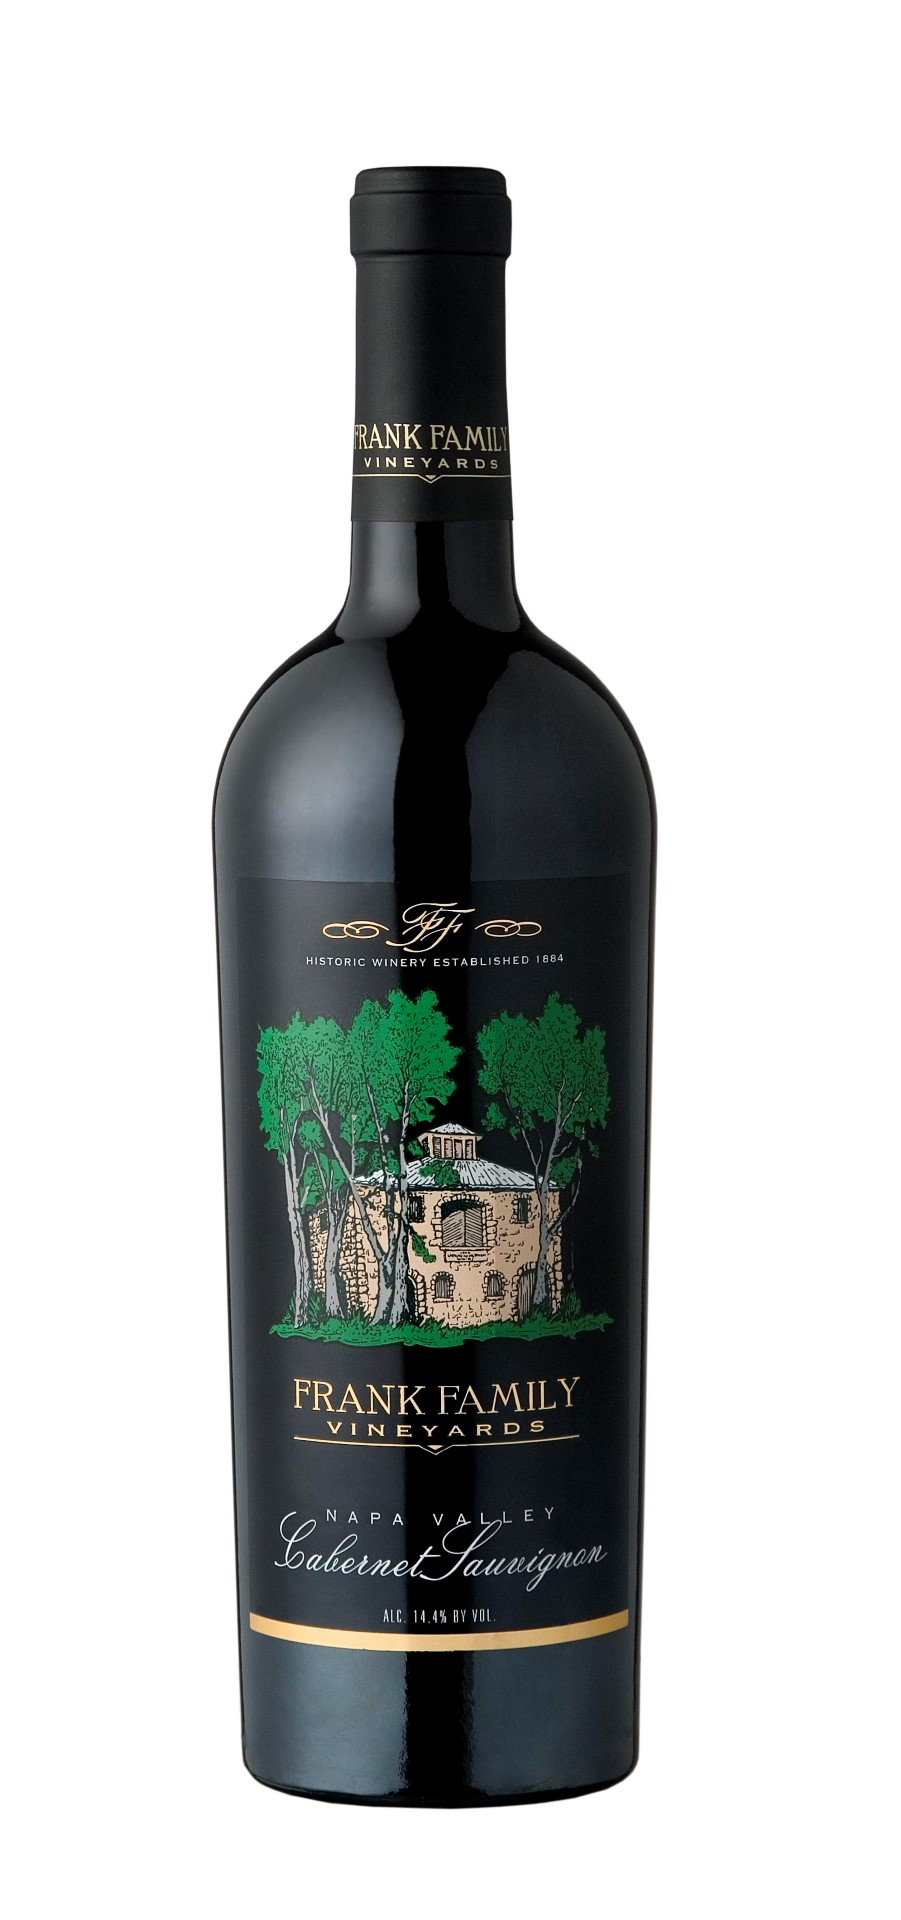 2013 Frank Family Vineyards Cabernet Sauvignon Napa Valley